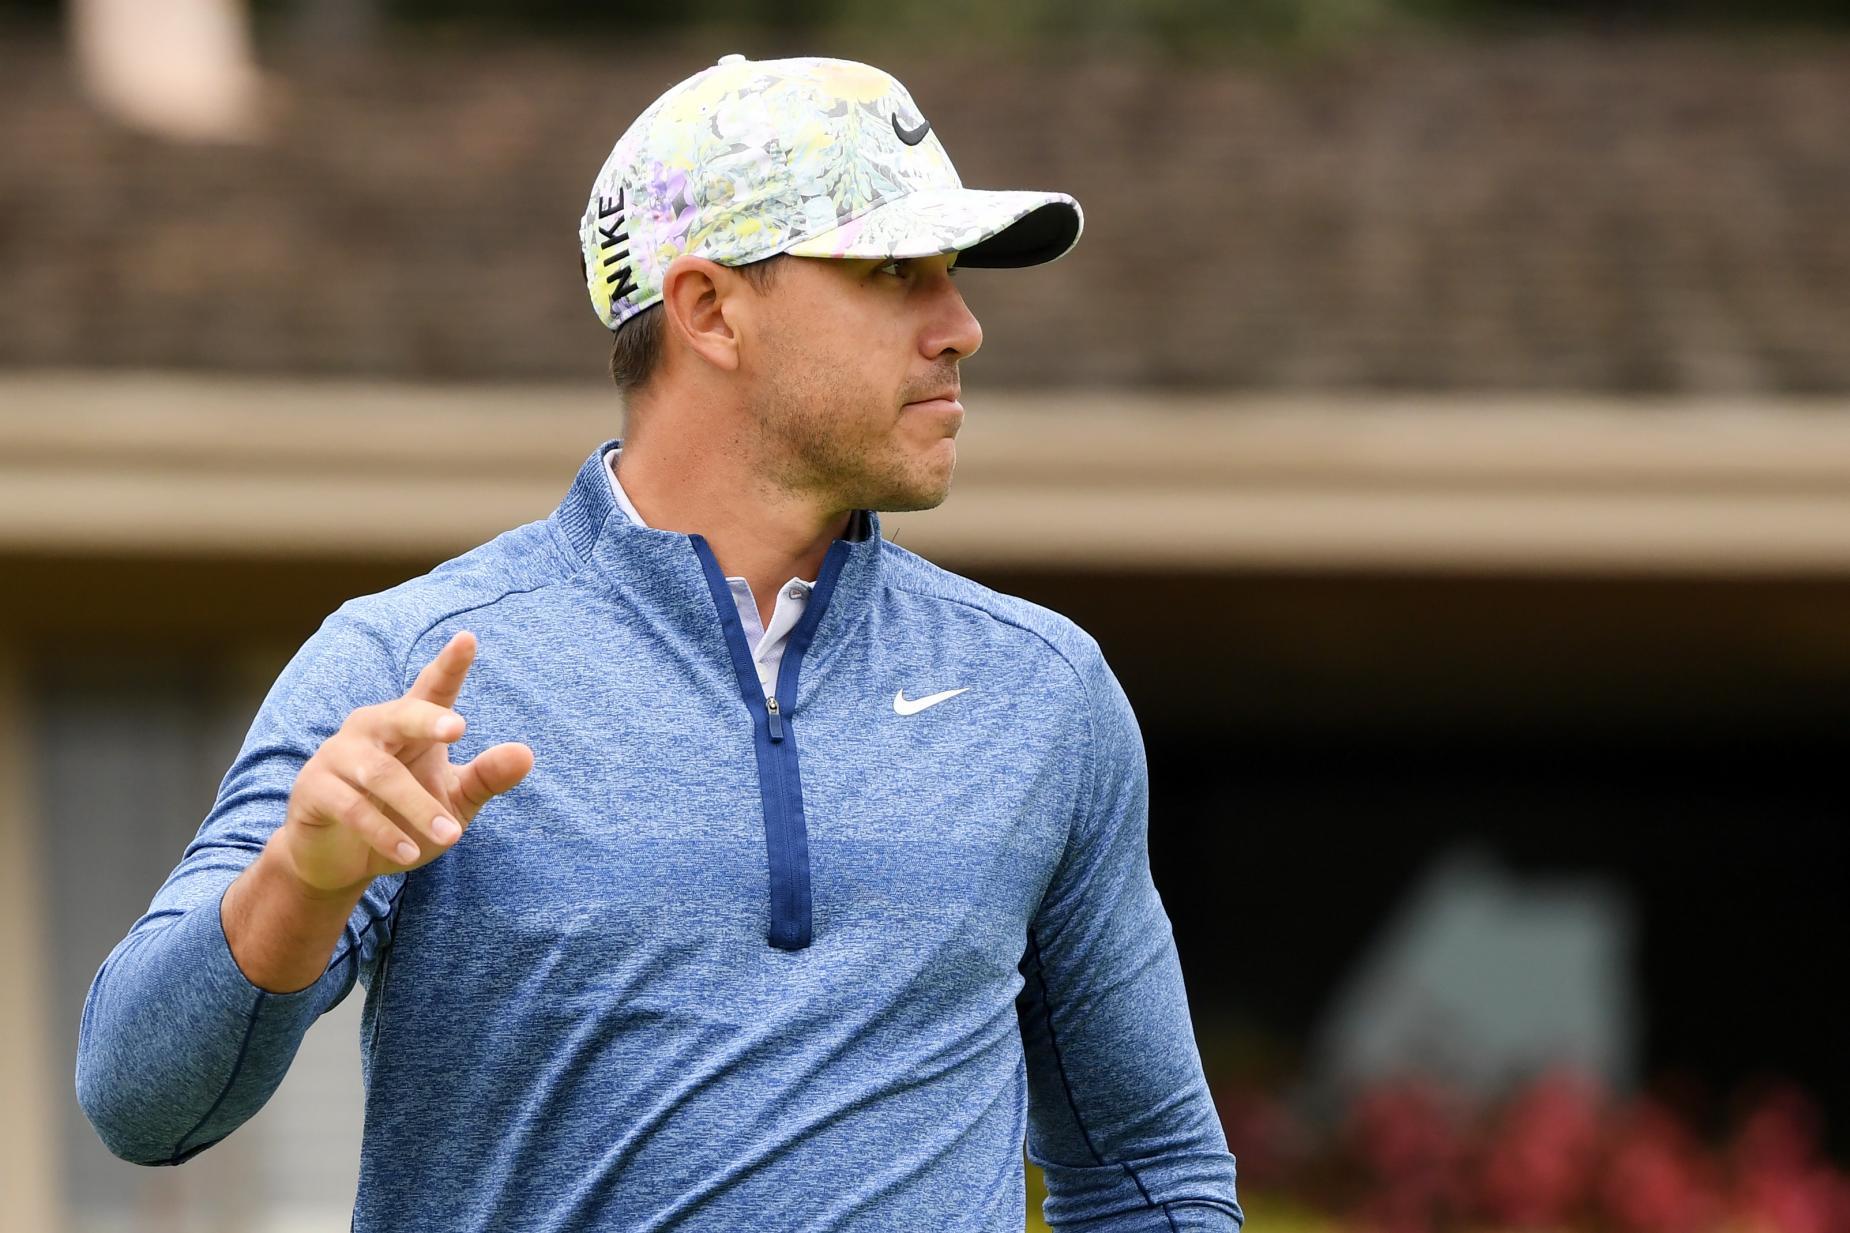 DeChambeau's rival Brooks Koepka wearing a Nike AeroBill Classic99 Printed Golf Hat during the 2019 U.S Open.